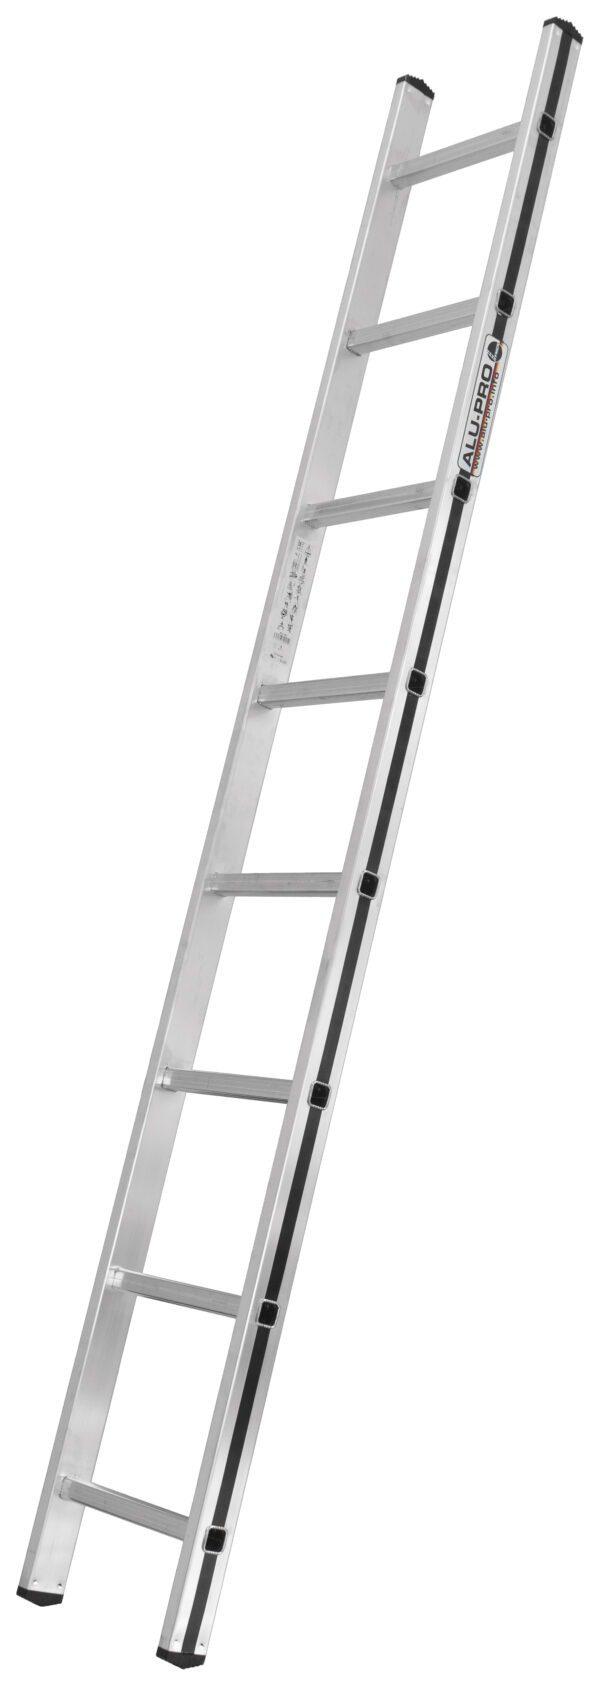 Black Line Single Ladders